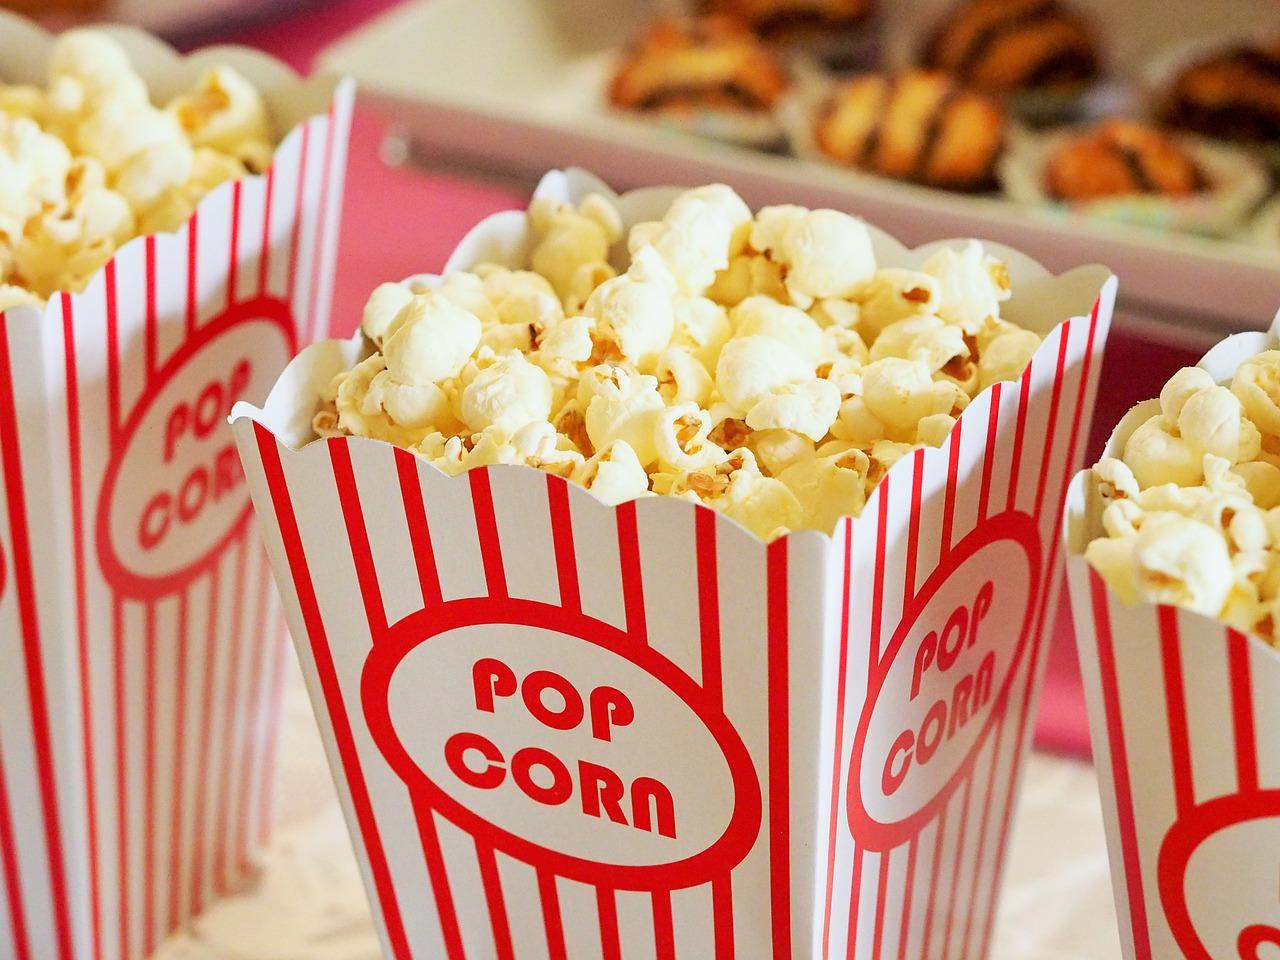 Popkorn im Kino